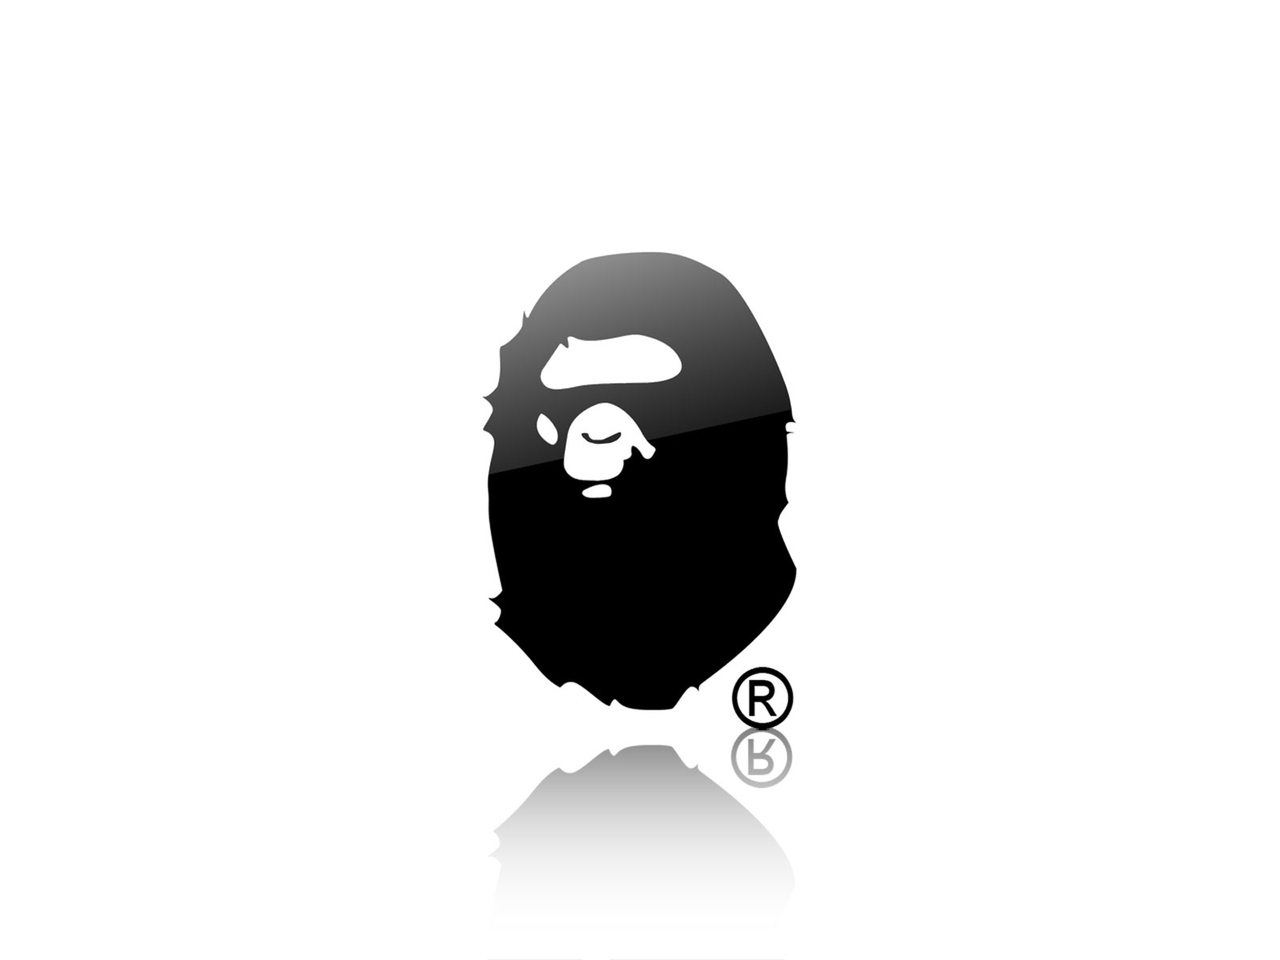 Watch further Render 11 Nakigitsune Touken Ranbu 522860950 in addition Bape Supreme Cartoon 1080 By moreover 火影天道佩恩壁纸 likewise Dragonball Z Wallpapers. on bape wallpaper anime